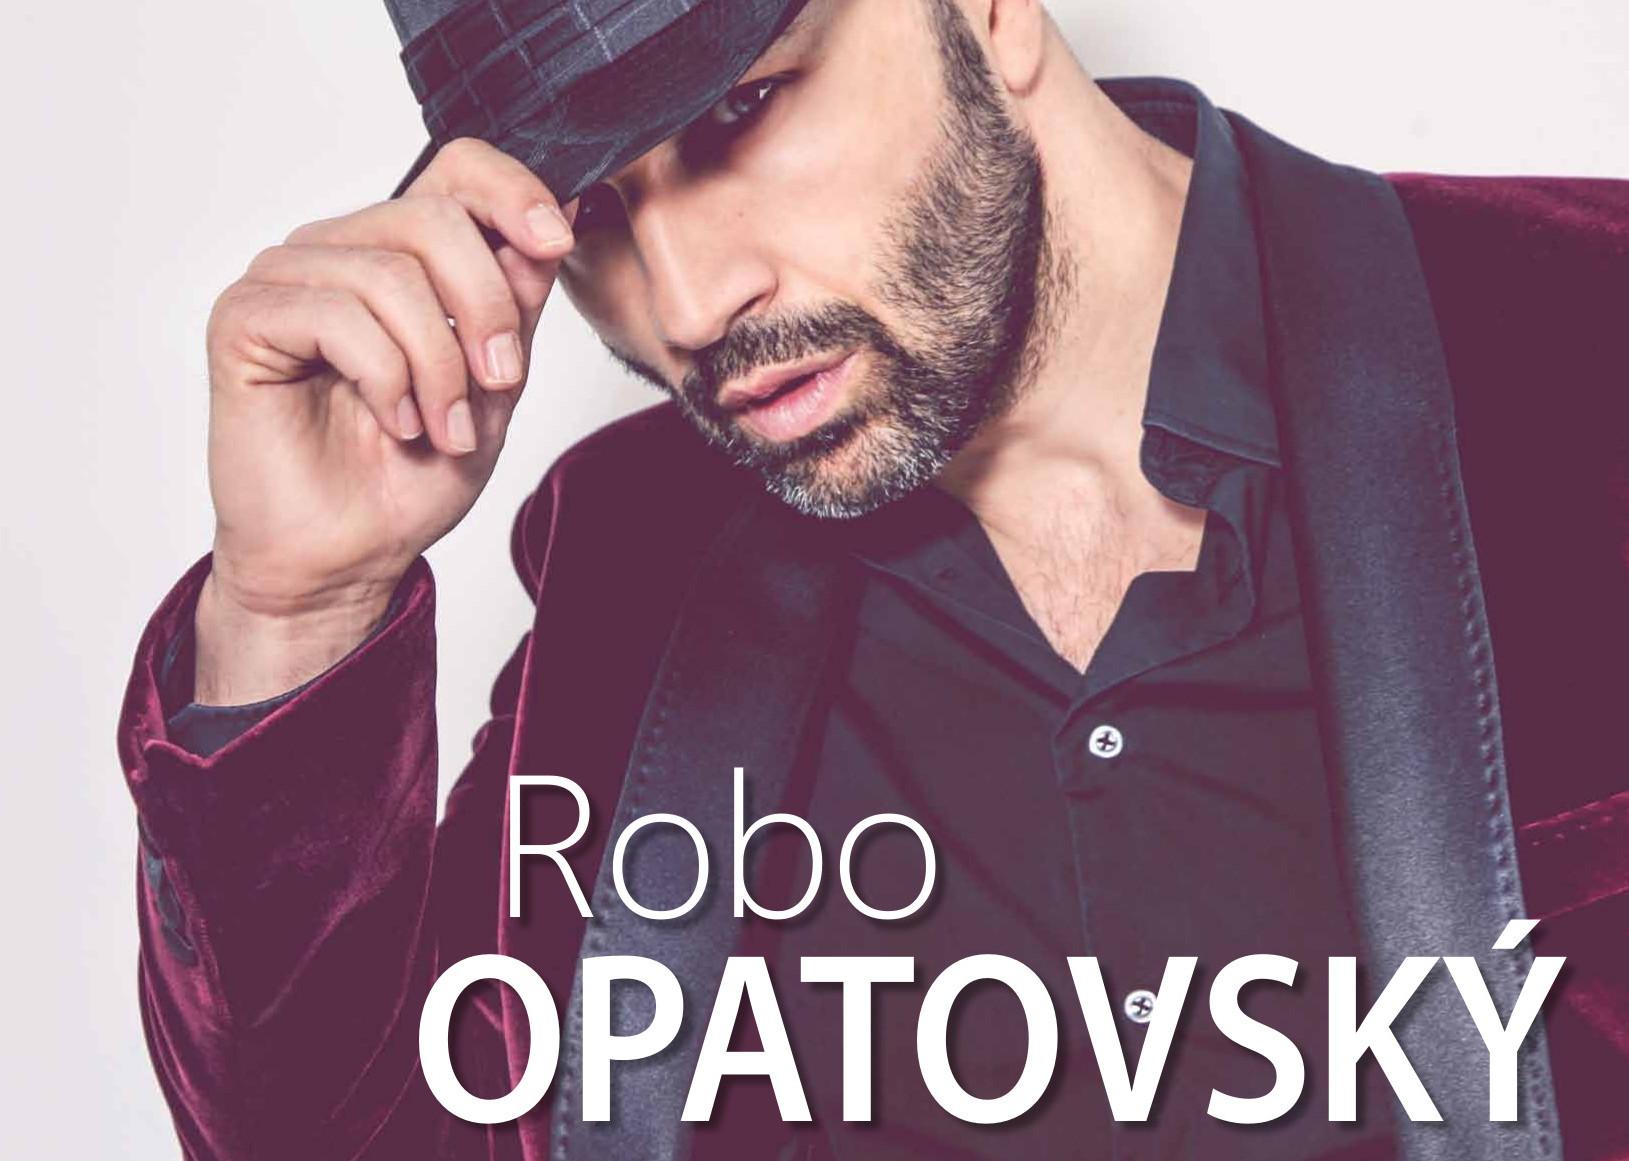 97a115724612 ROBO OPATOVSKÝ UNPLUGGED TOUR 2017 už - Katalóg firiem